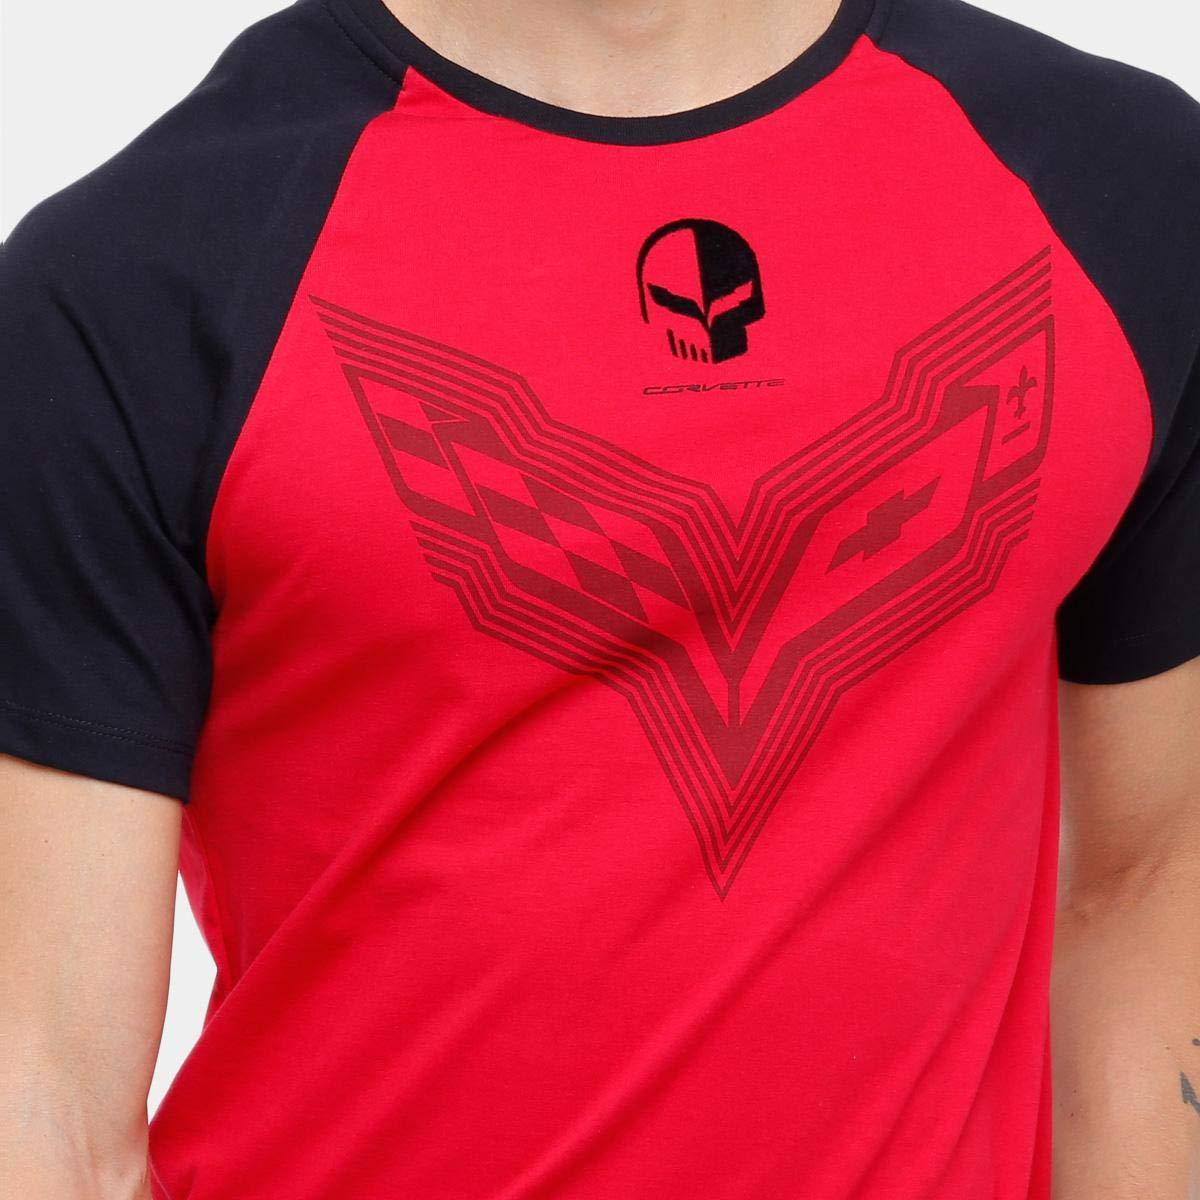 e825fd7455 Camiseta Corvette Raglan Mixed Flame Masculina - Vermelho+preto - G   Amazon.com.br  Amazon Moda